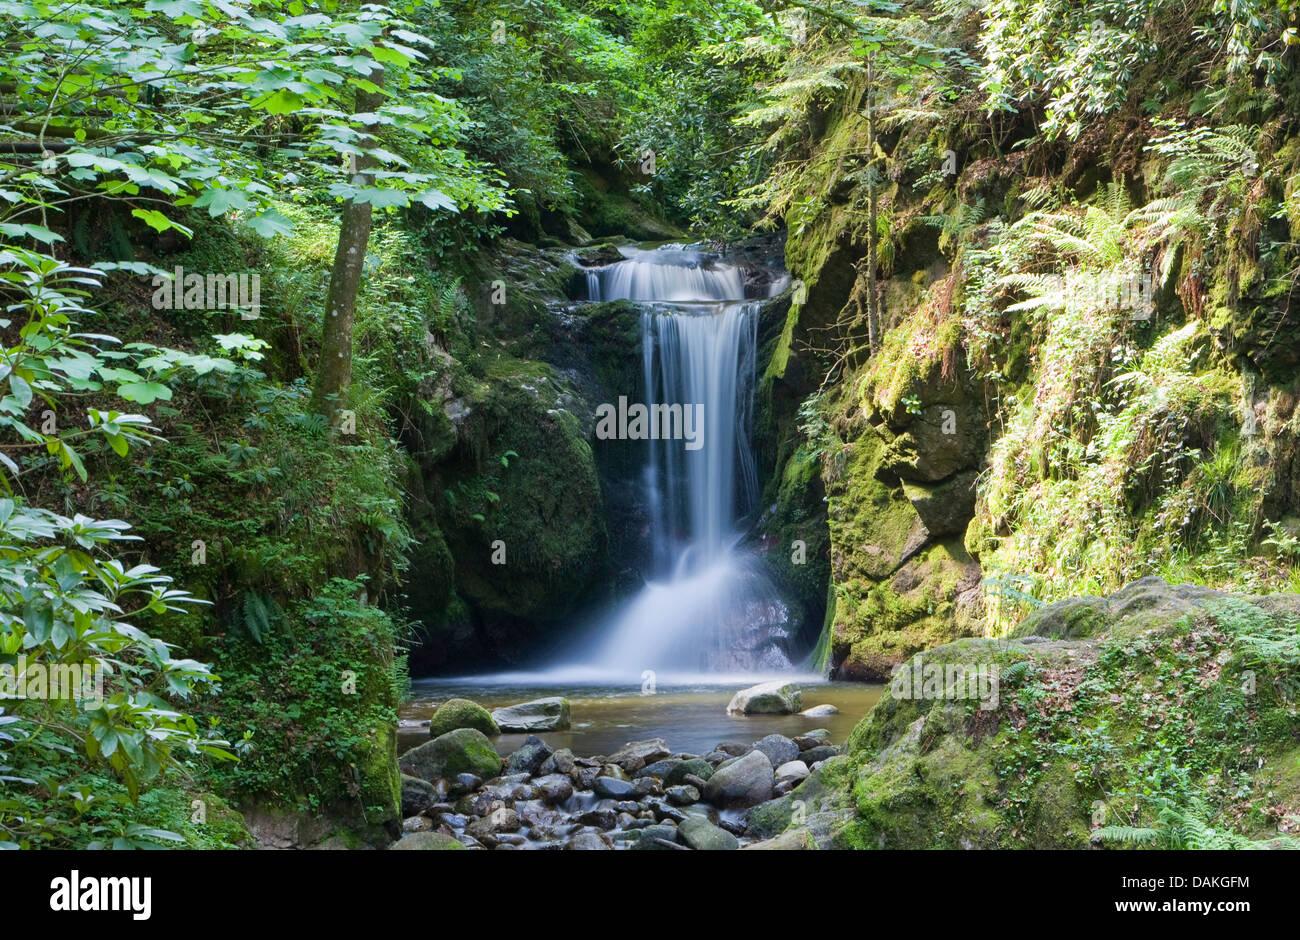 geological natural monument Geroldsau waterfall, Germany, Baden-Wuerttemberg, Baden-Baden - Stock Image